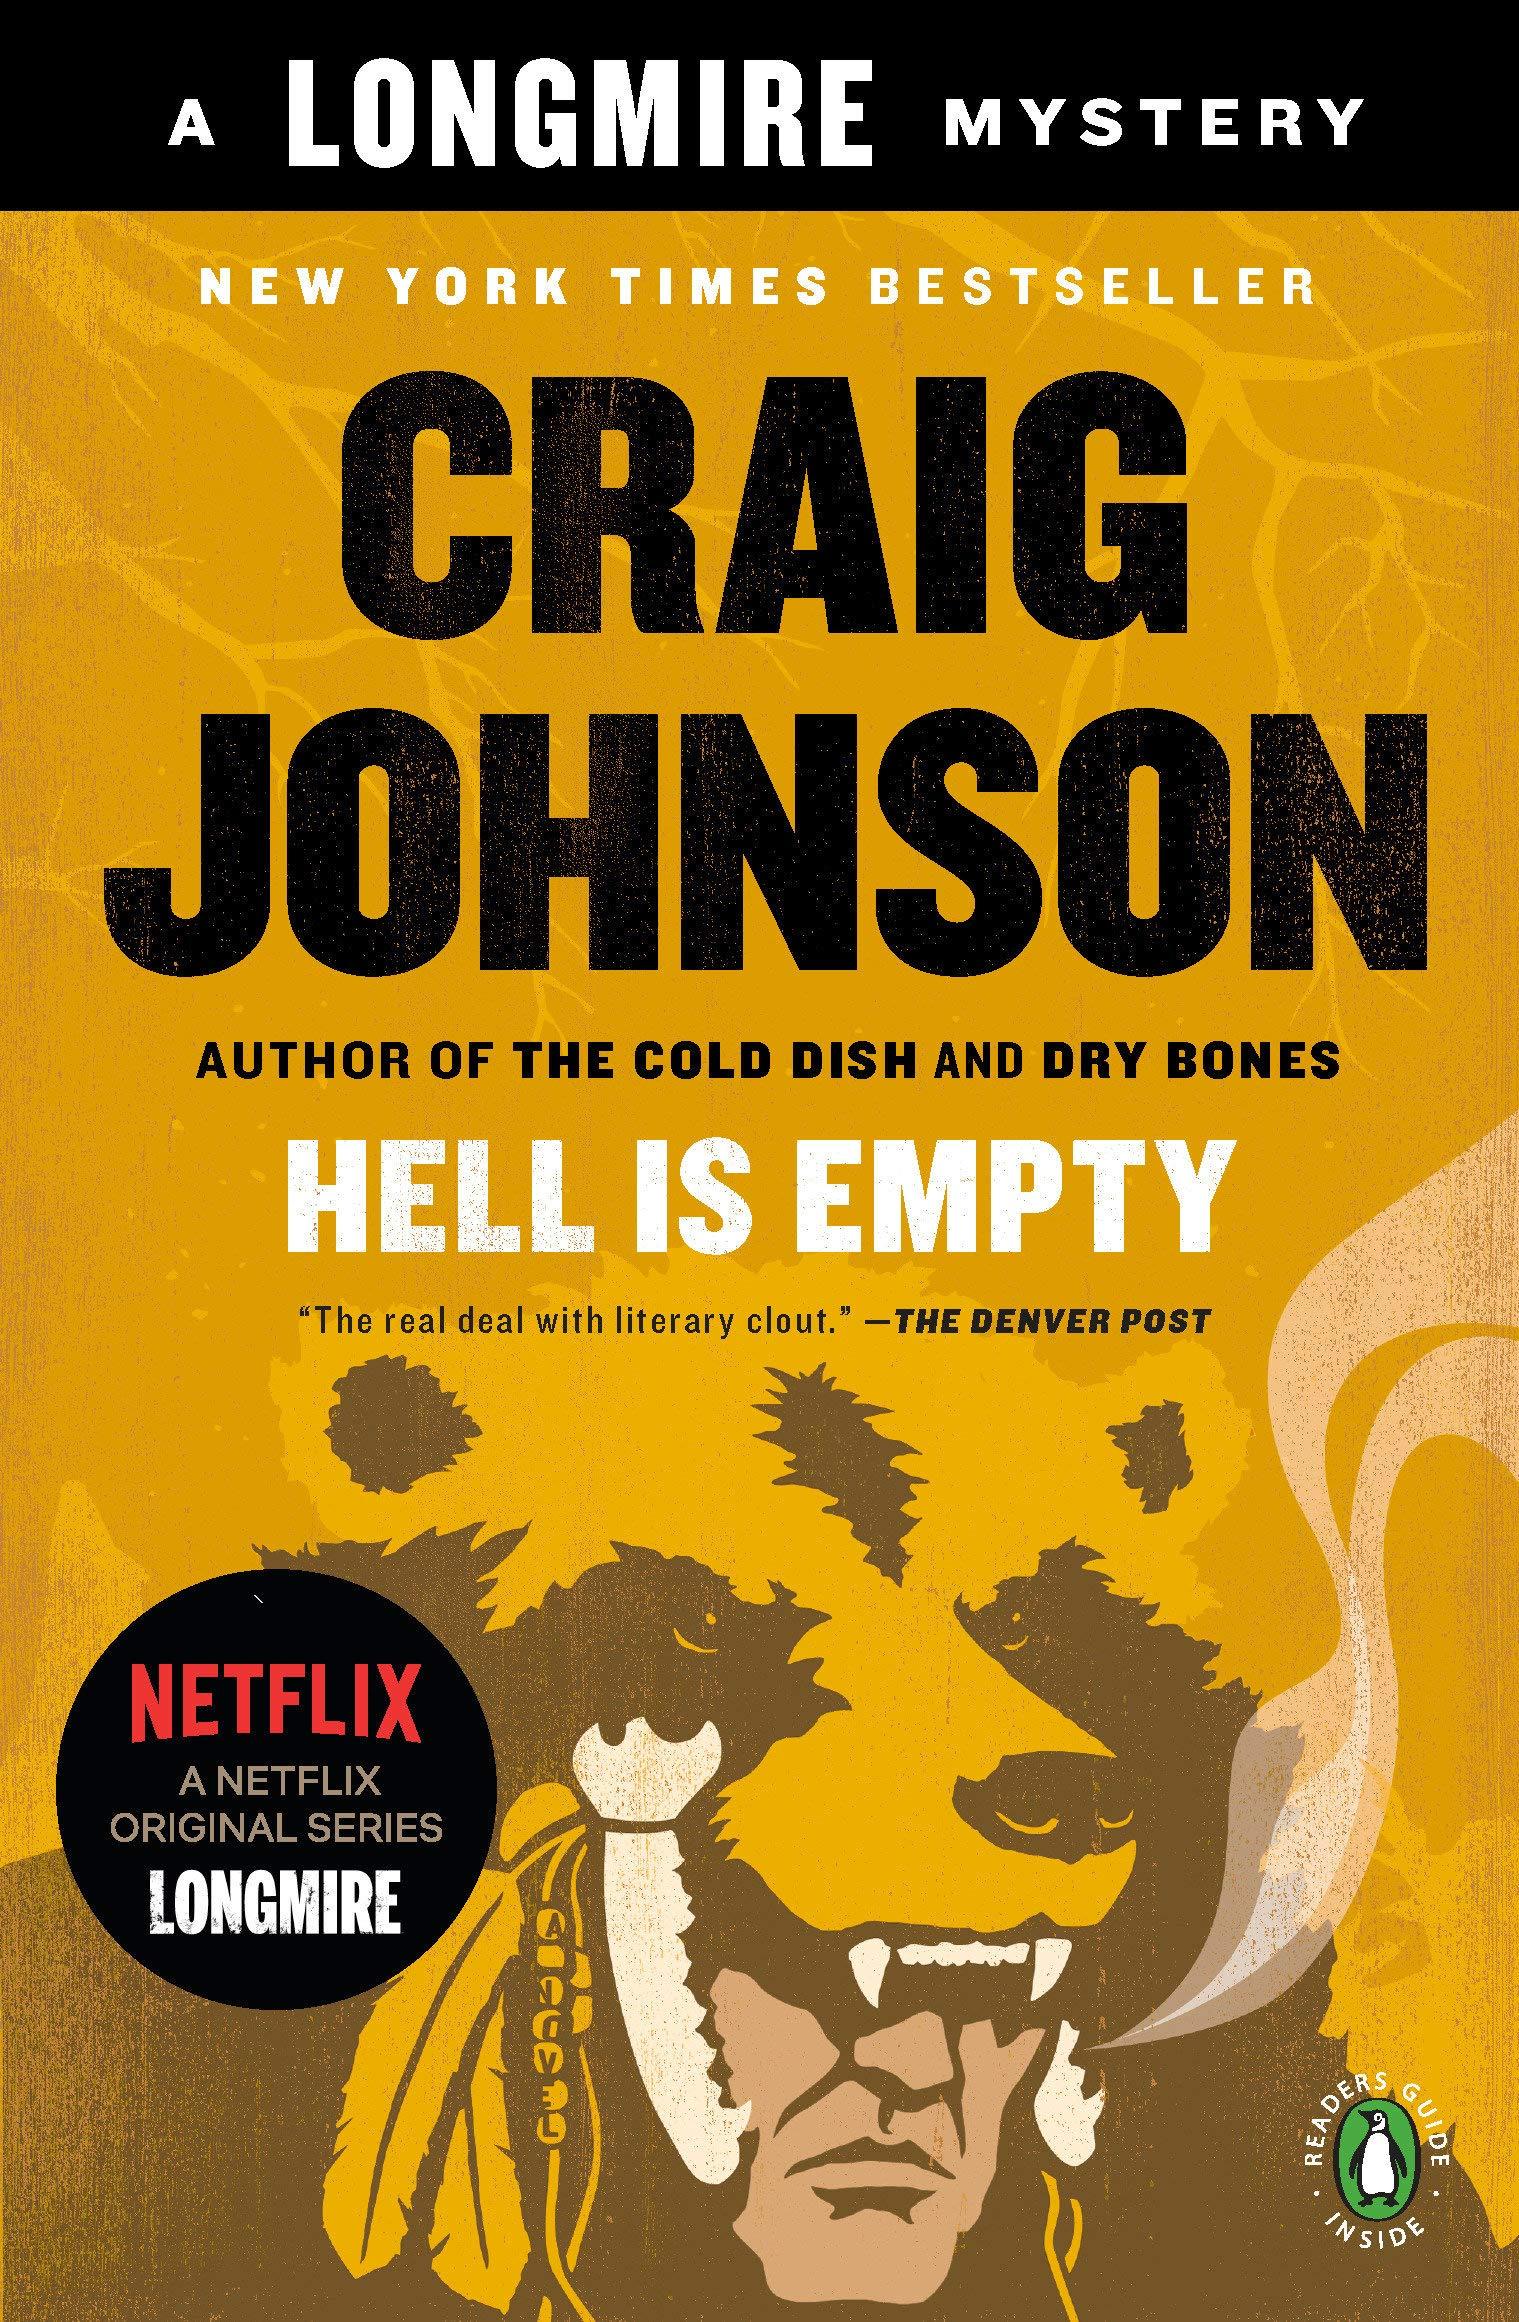 Amazon.fr - Hell Is Empty  A Longmire Mystery - Craig Johnson - Livres 7e7a55594b2a